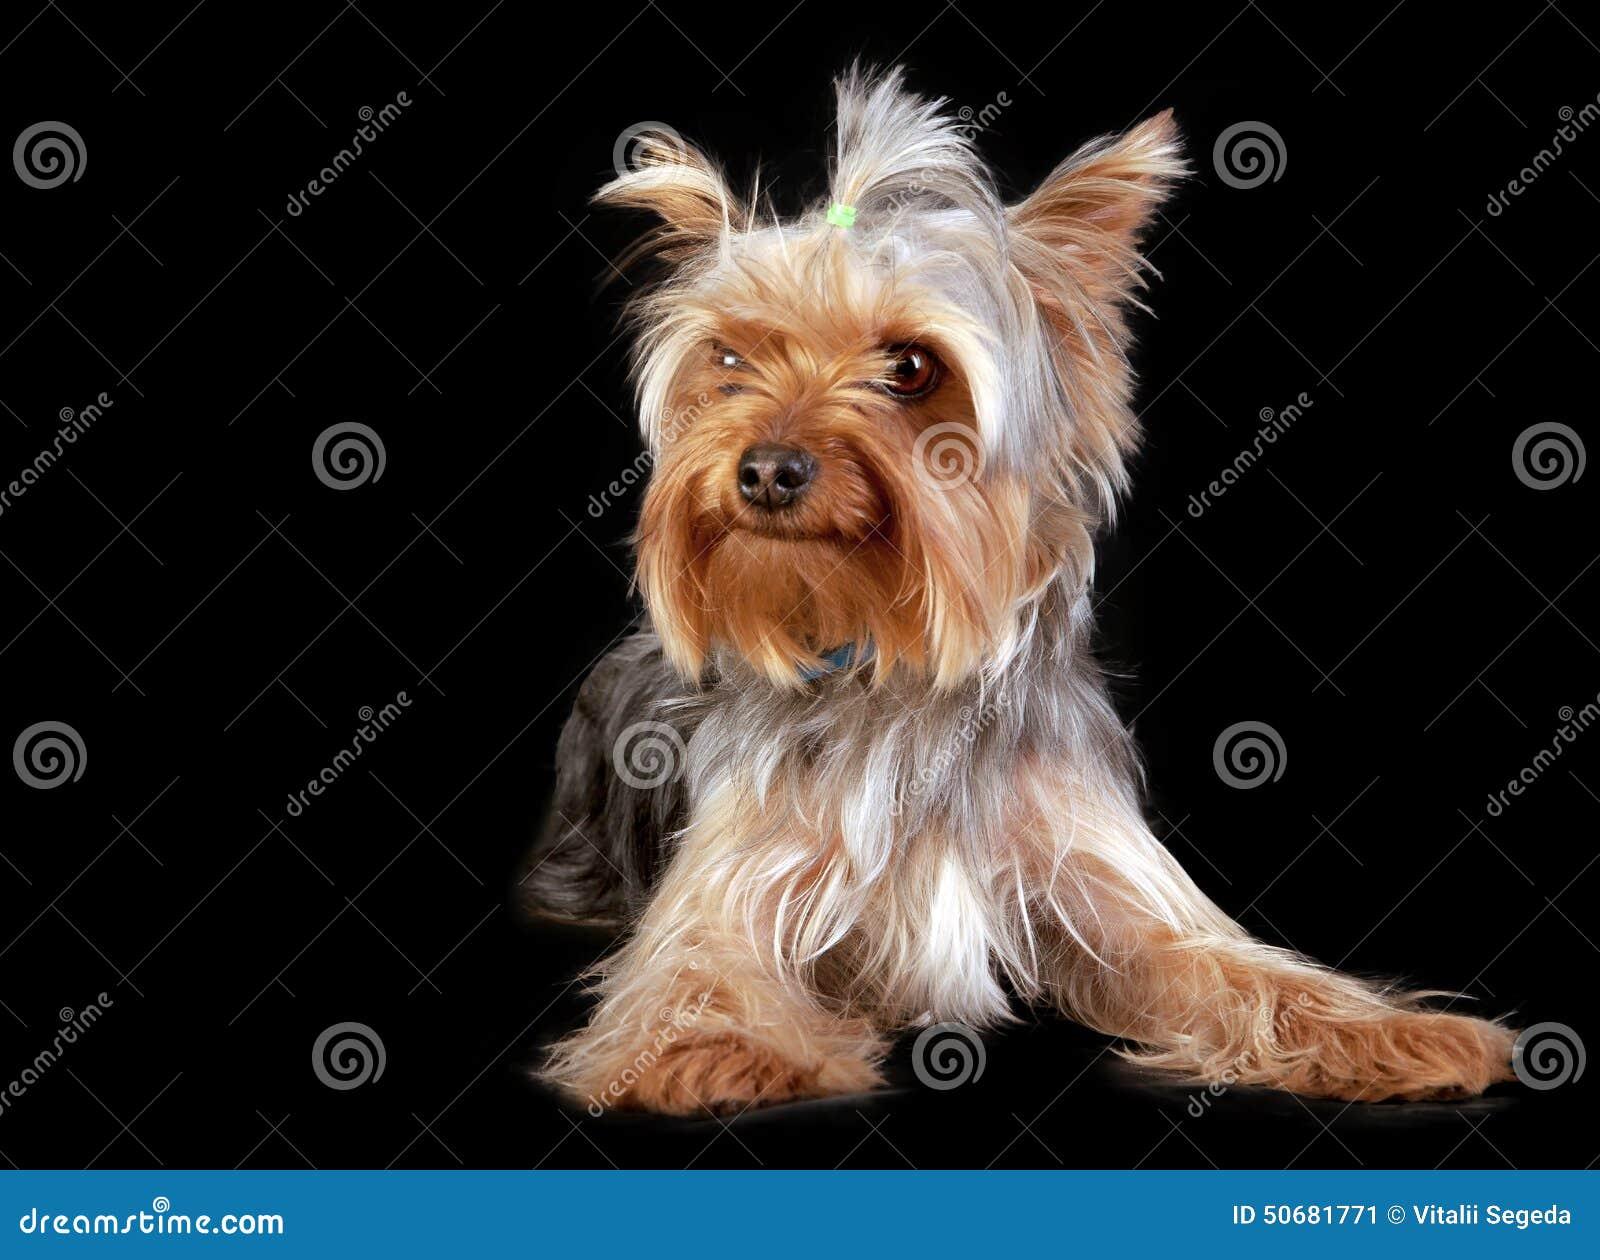 Download 约克夏狗 库存图片. 图片 包括有 beauvoir, 鼻子, browne, 纵向, 家谱, 眼睛, 国内 - 50681771